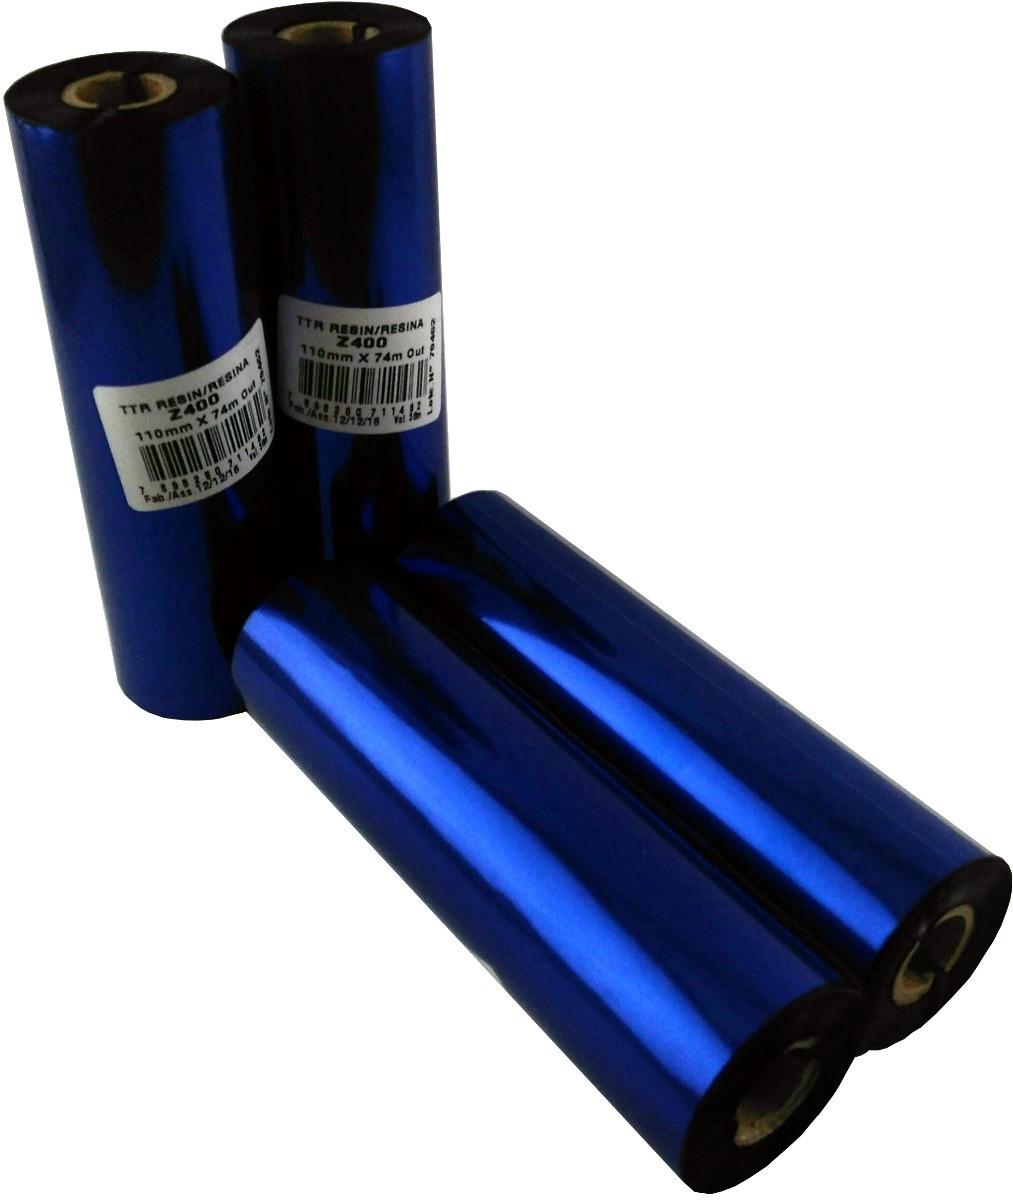 10 Rolos | Ribbon Resina Z400 110X74